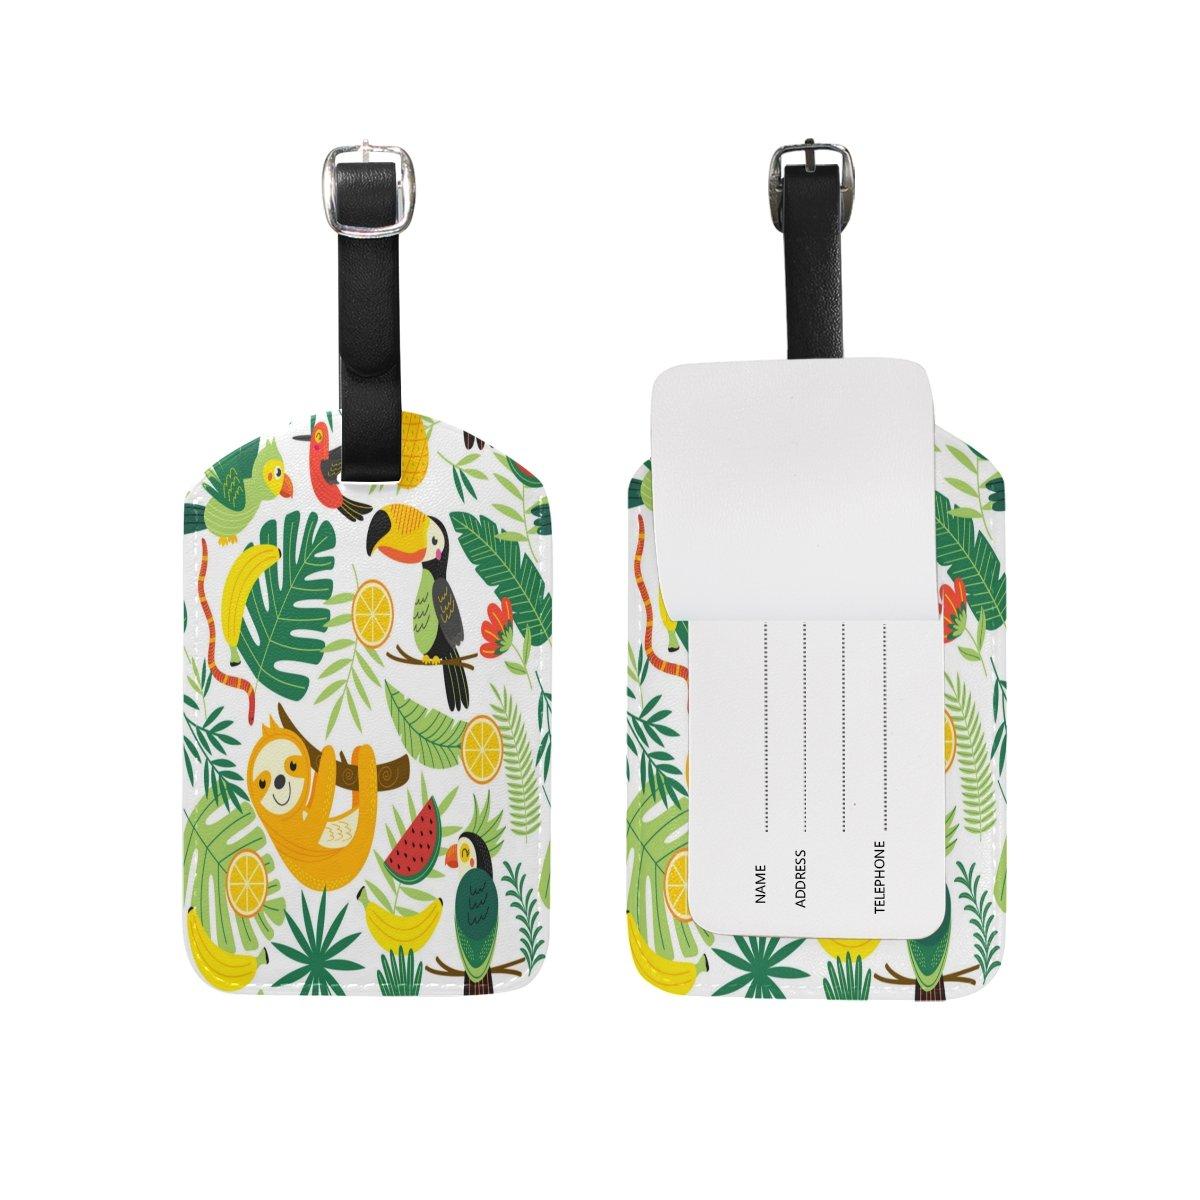 1Pcs Saobao Travel Luggage Tag Tropical Animals Sloth PU Leather Baggage Suitcase Travel ID Bag Tag